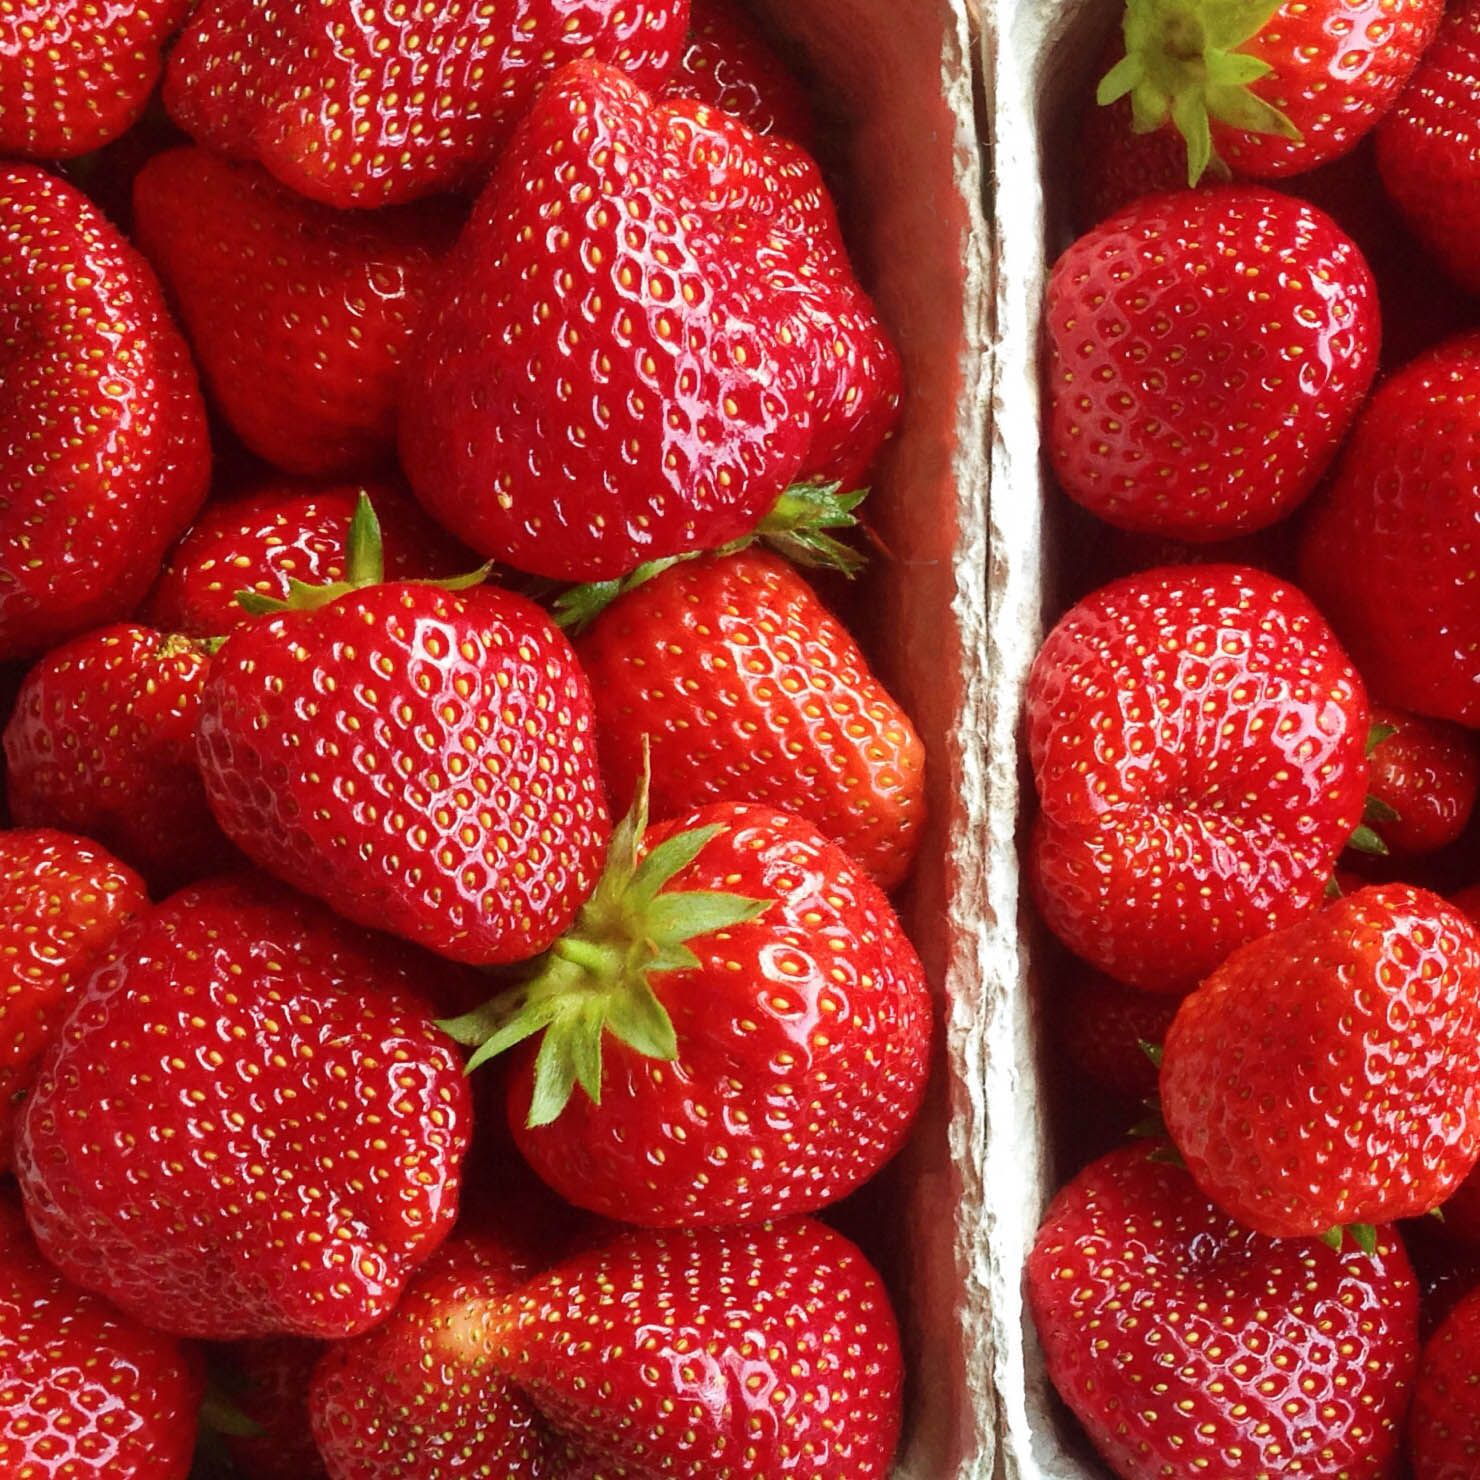 Raw Til 4 Meal Plan Raw food detox, Vegan meal plans